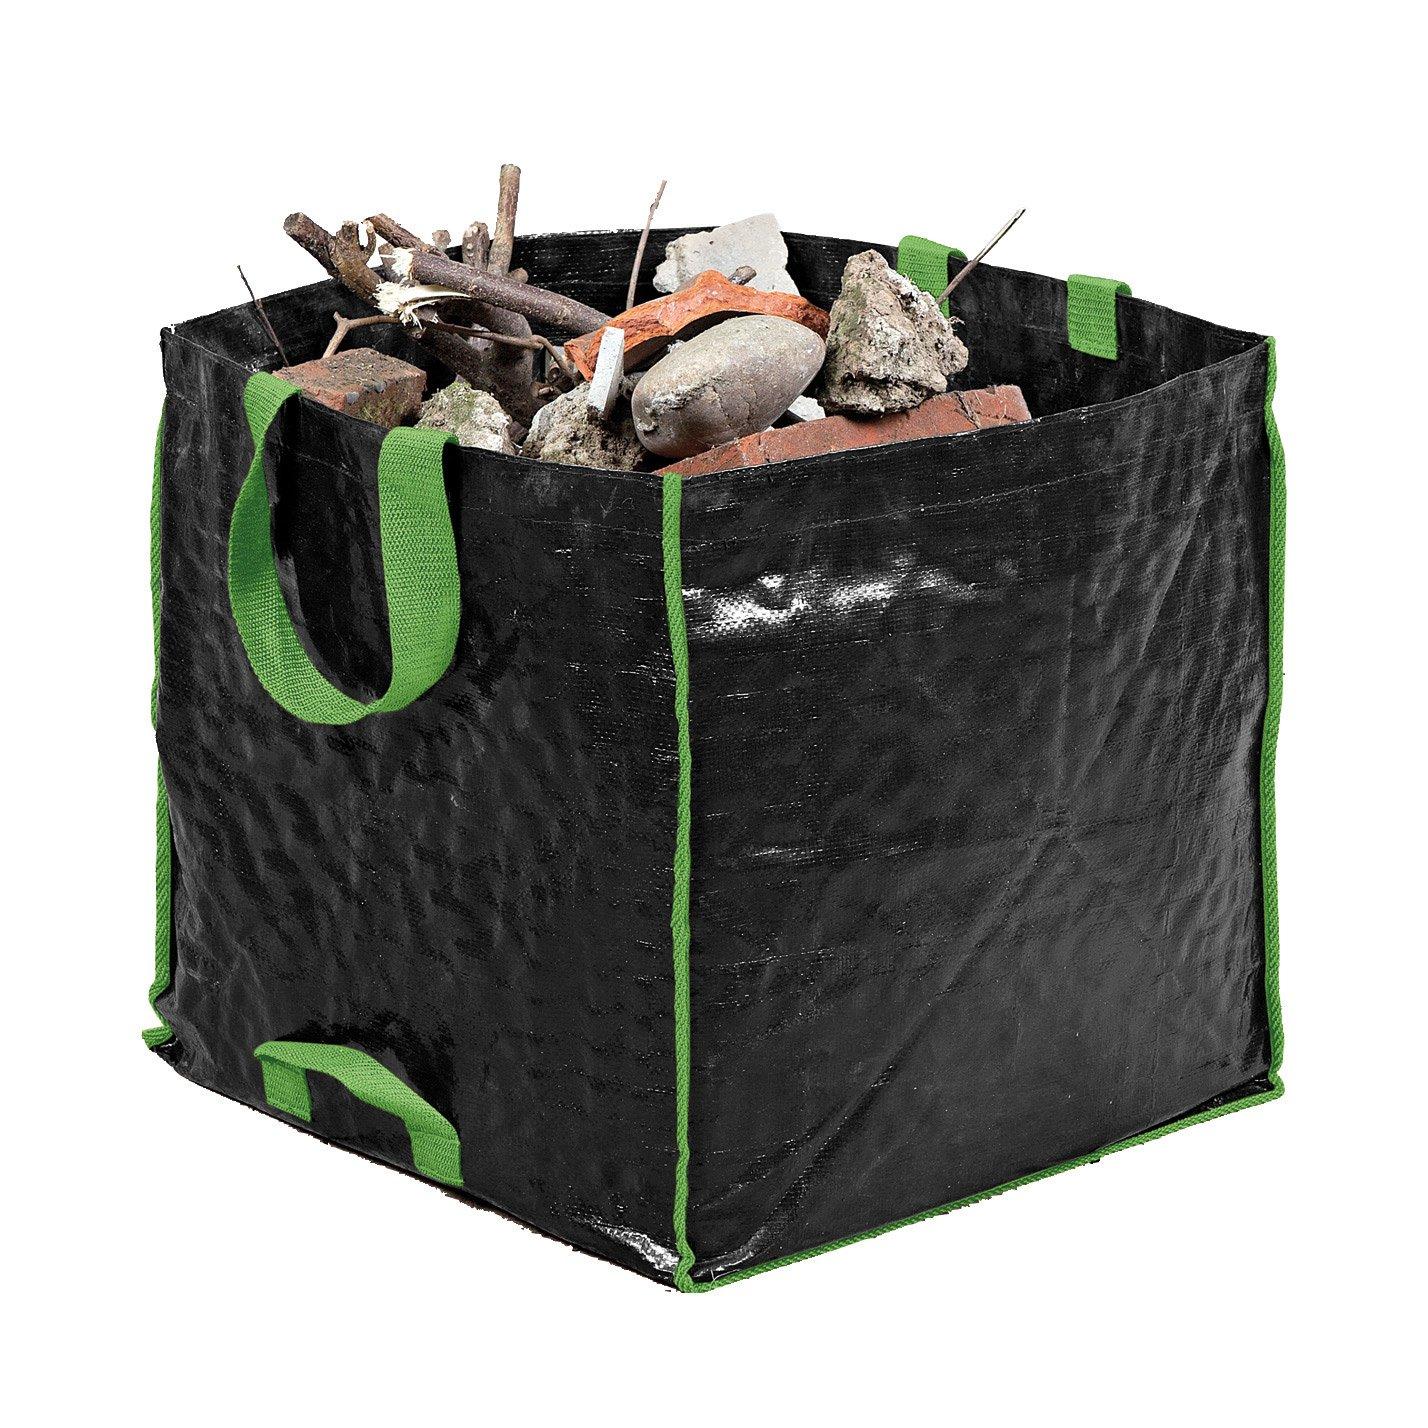 sac gravats et bois de jardin geolia 70 l leroy merlin. Black Bedroom Furniture Sets. Home Design Ideas